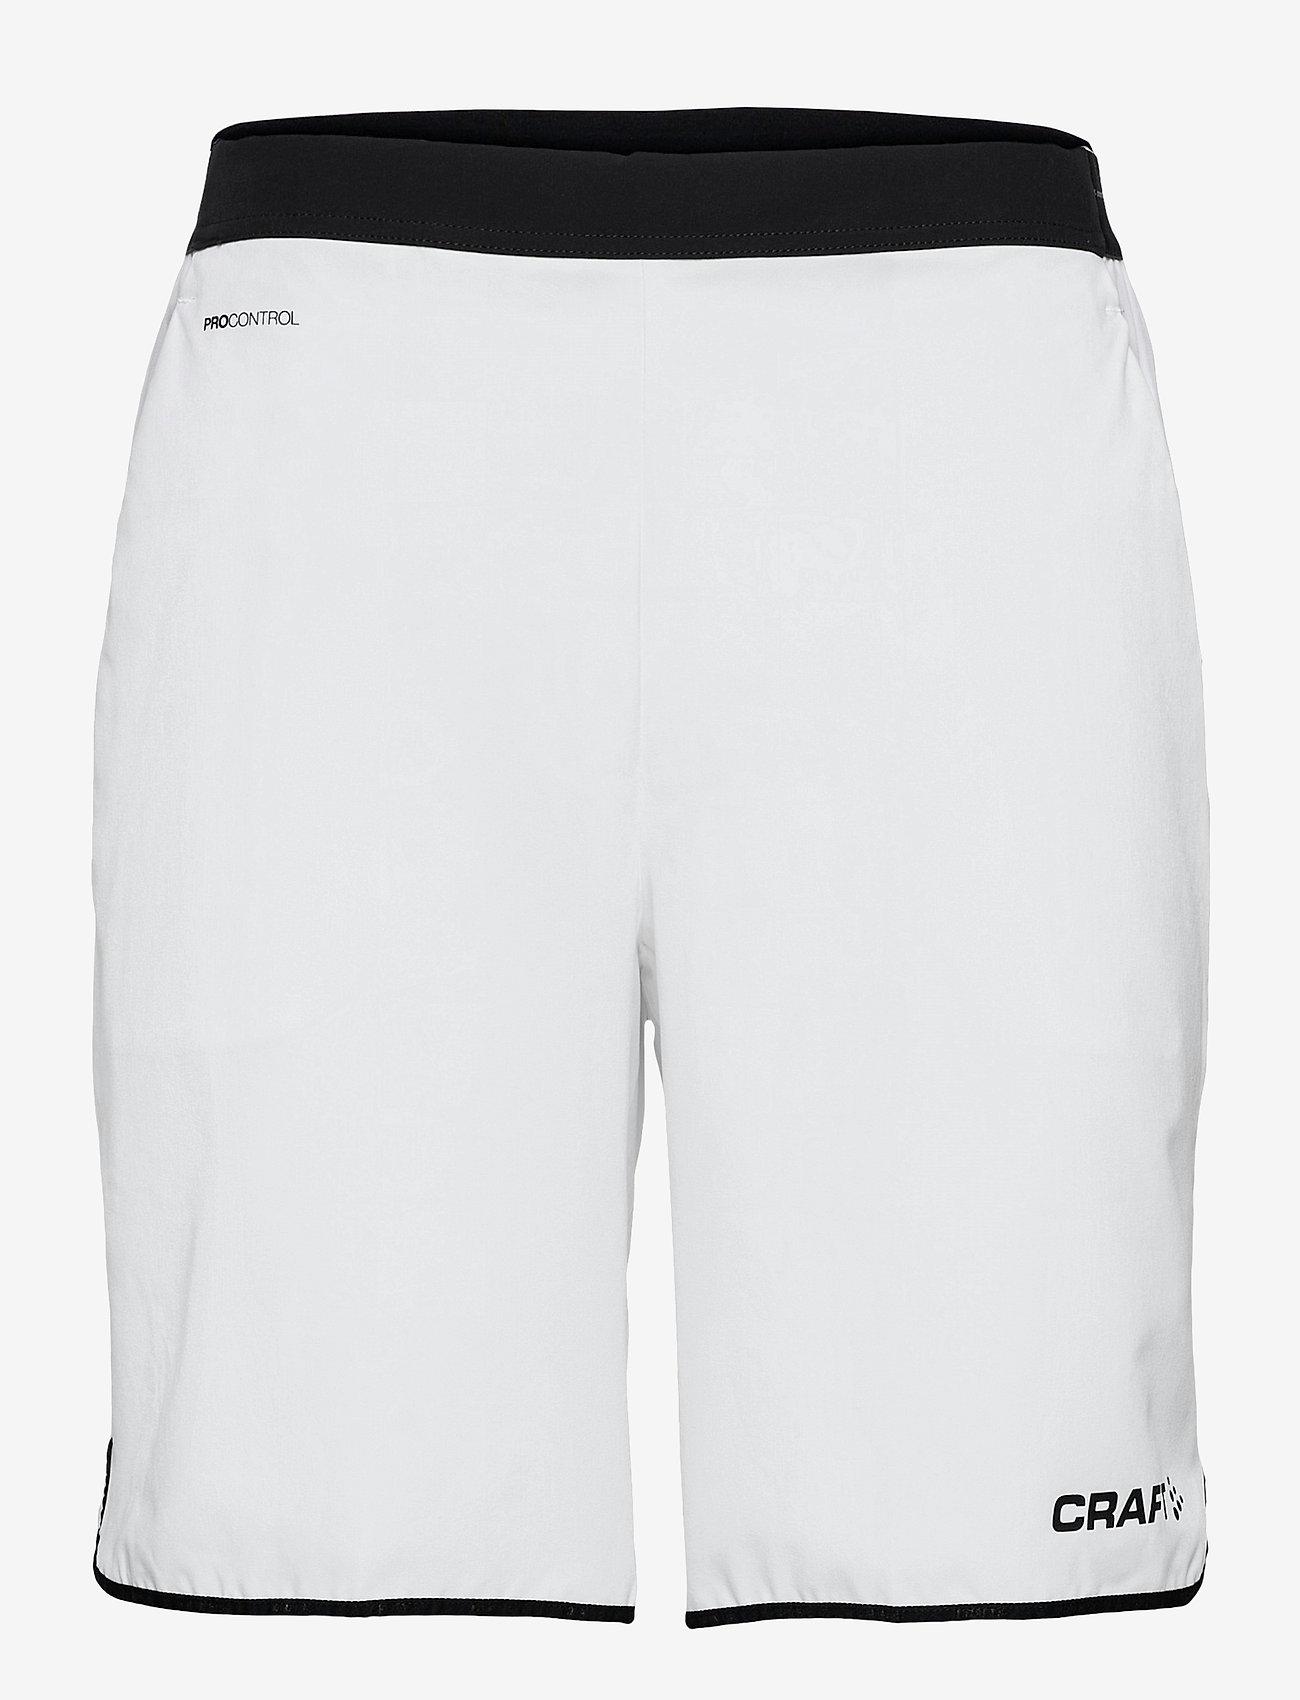 Craft - Pro Control Impact Shorts M - training korte broek - white/black - 0